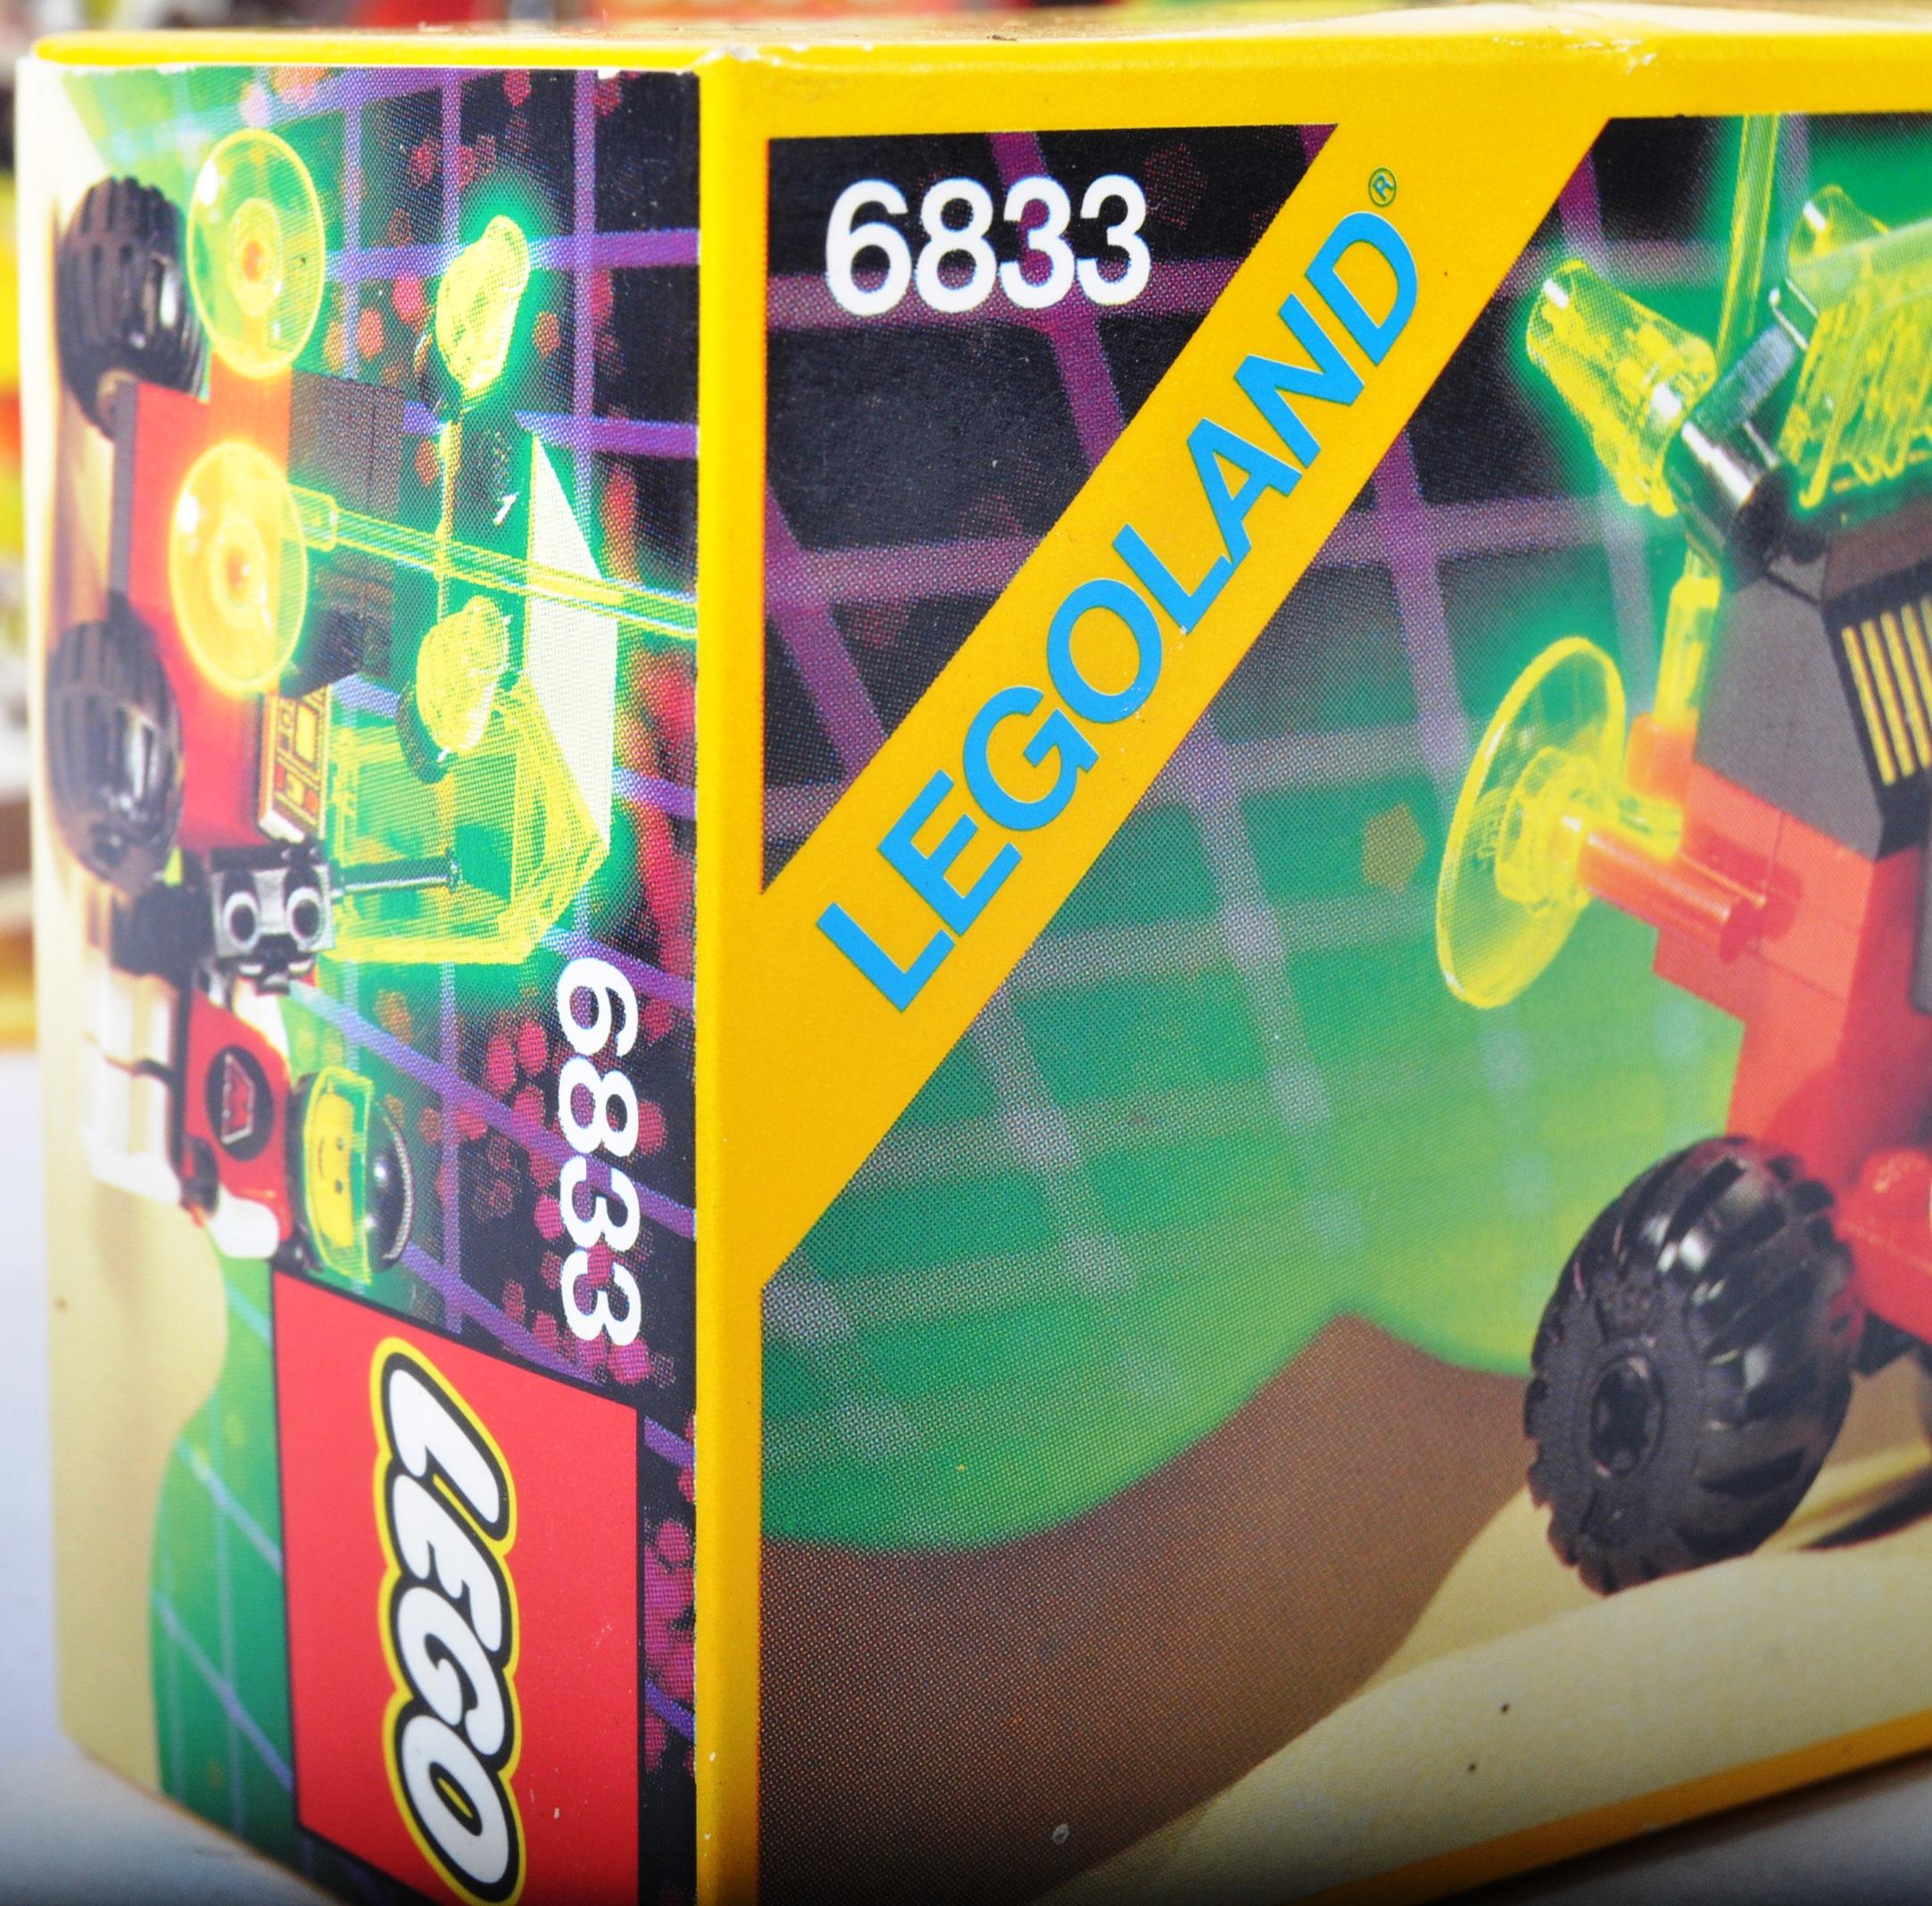 LEGO SETS - BLACKTRON - 6832 / 6833 / 6851 / 6878 / 6887 - Image 5 of 10